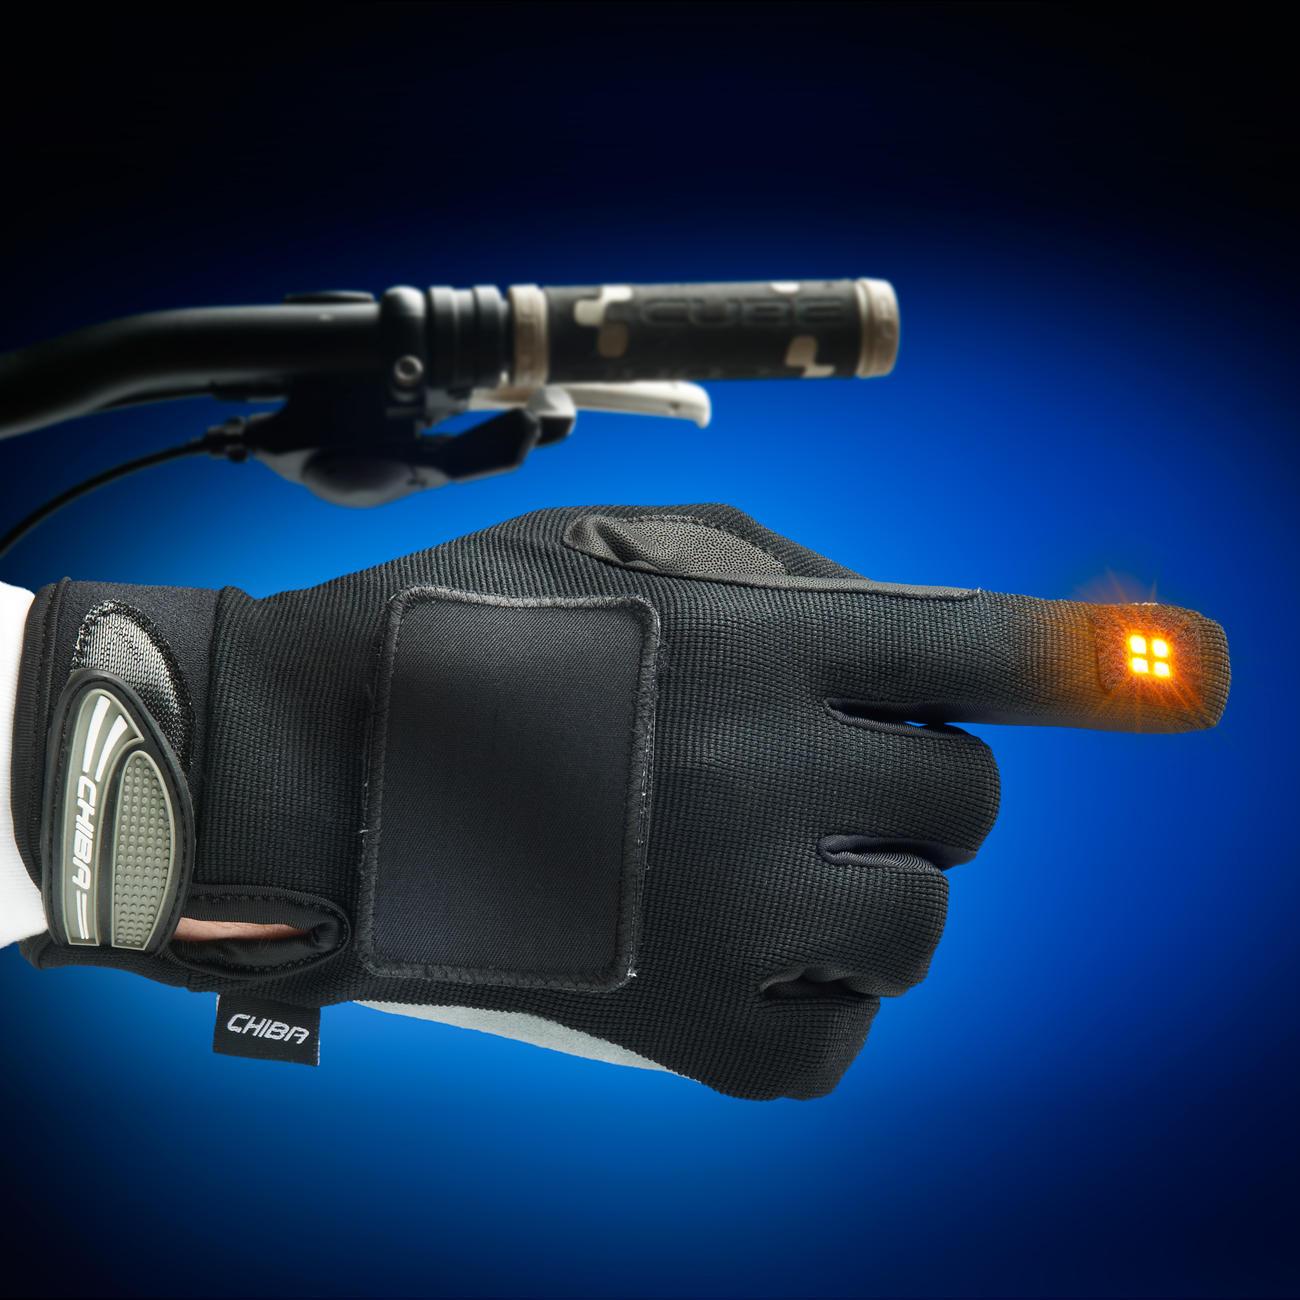 gtc blinker handschuh xs 3 jahre garantie pro idee. Black Bedroom Furniture Sets. Home Design Ideas